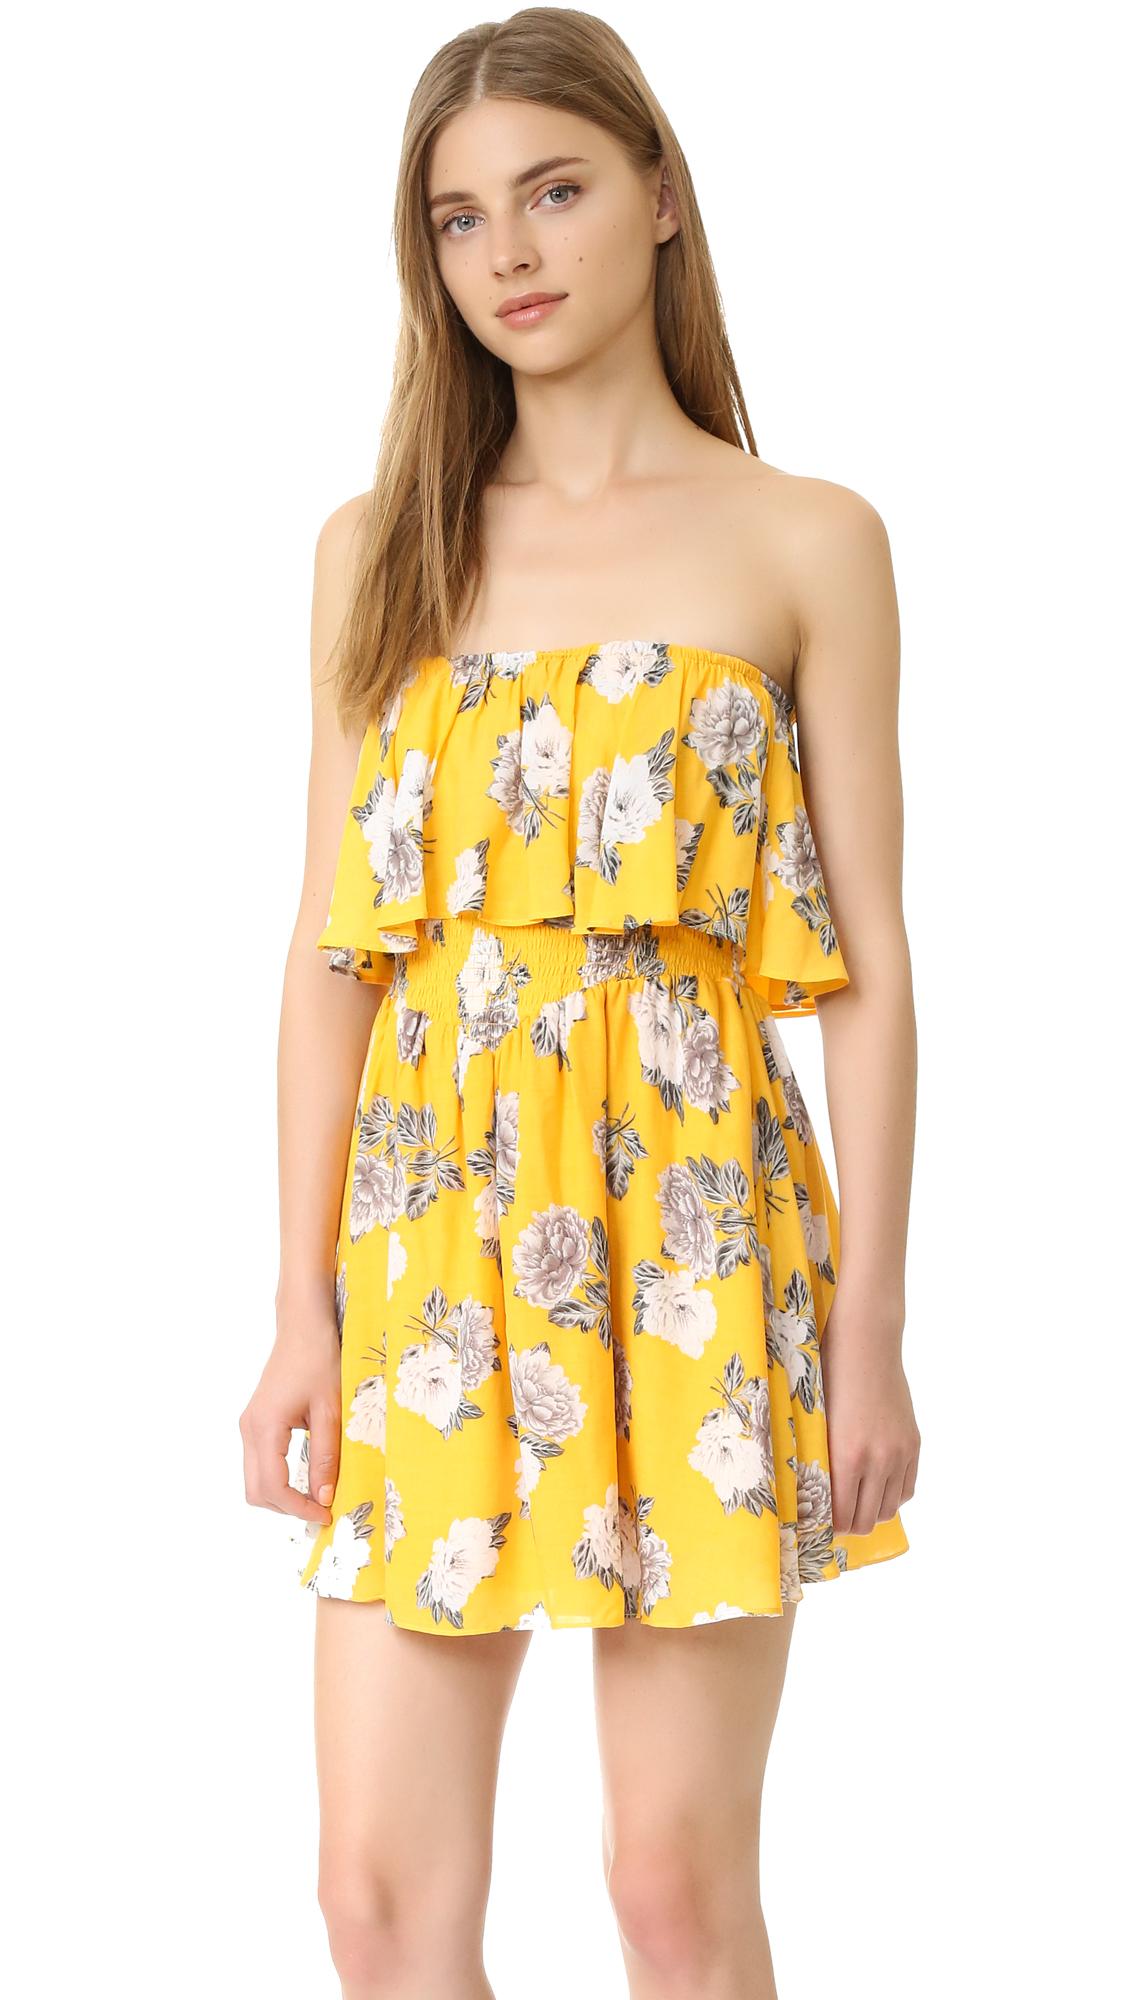 Minkpink clothing online